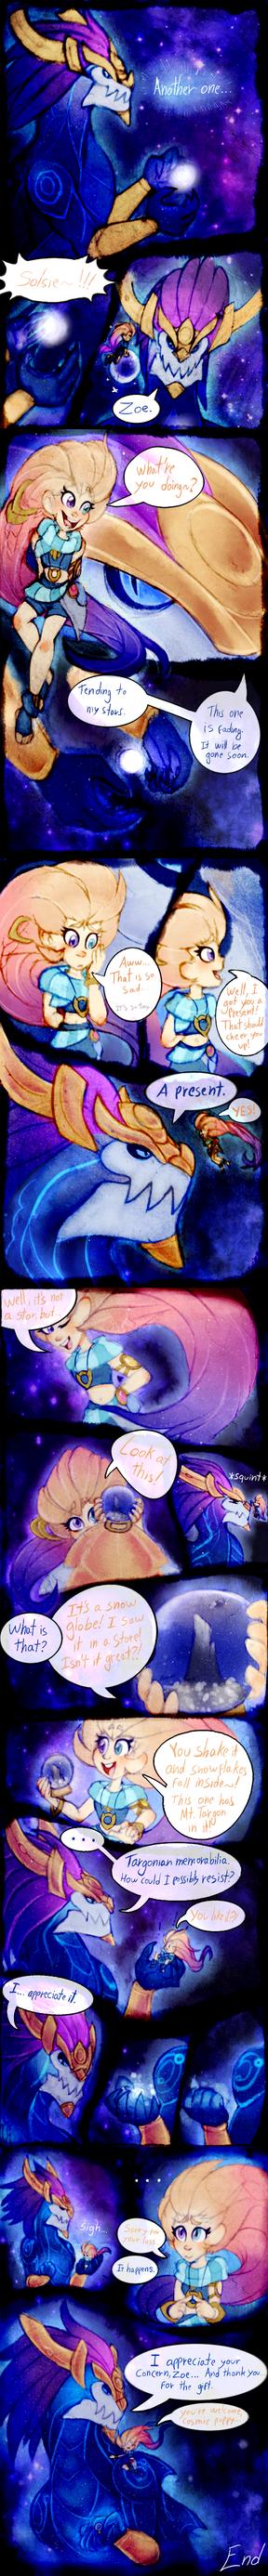 Aurelion Sol and Zoe comic by MonoShuga